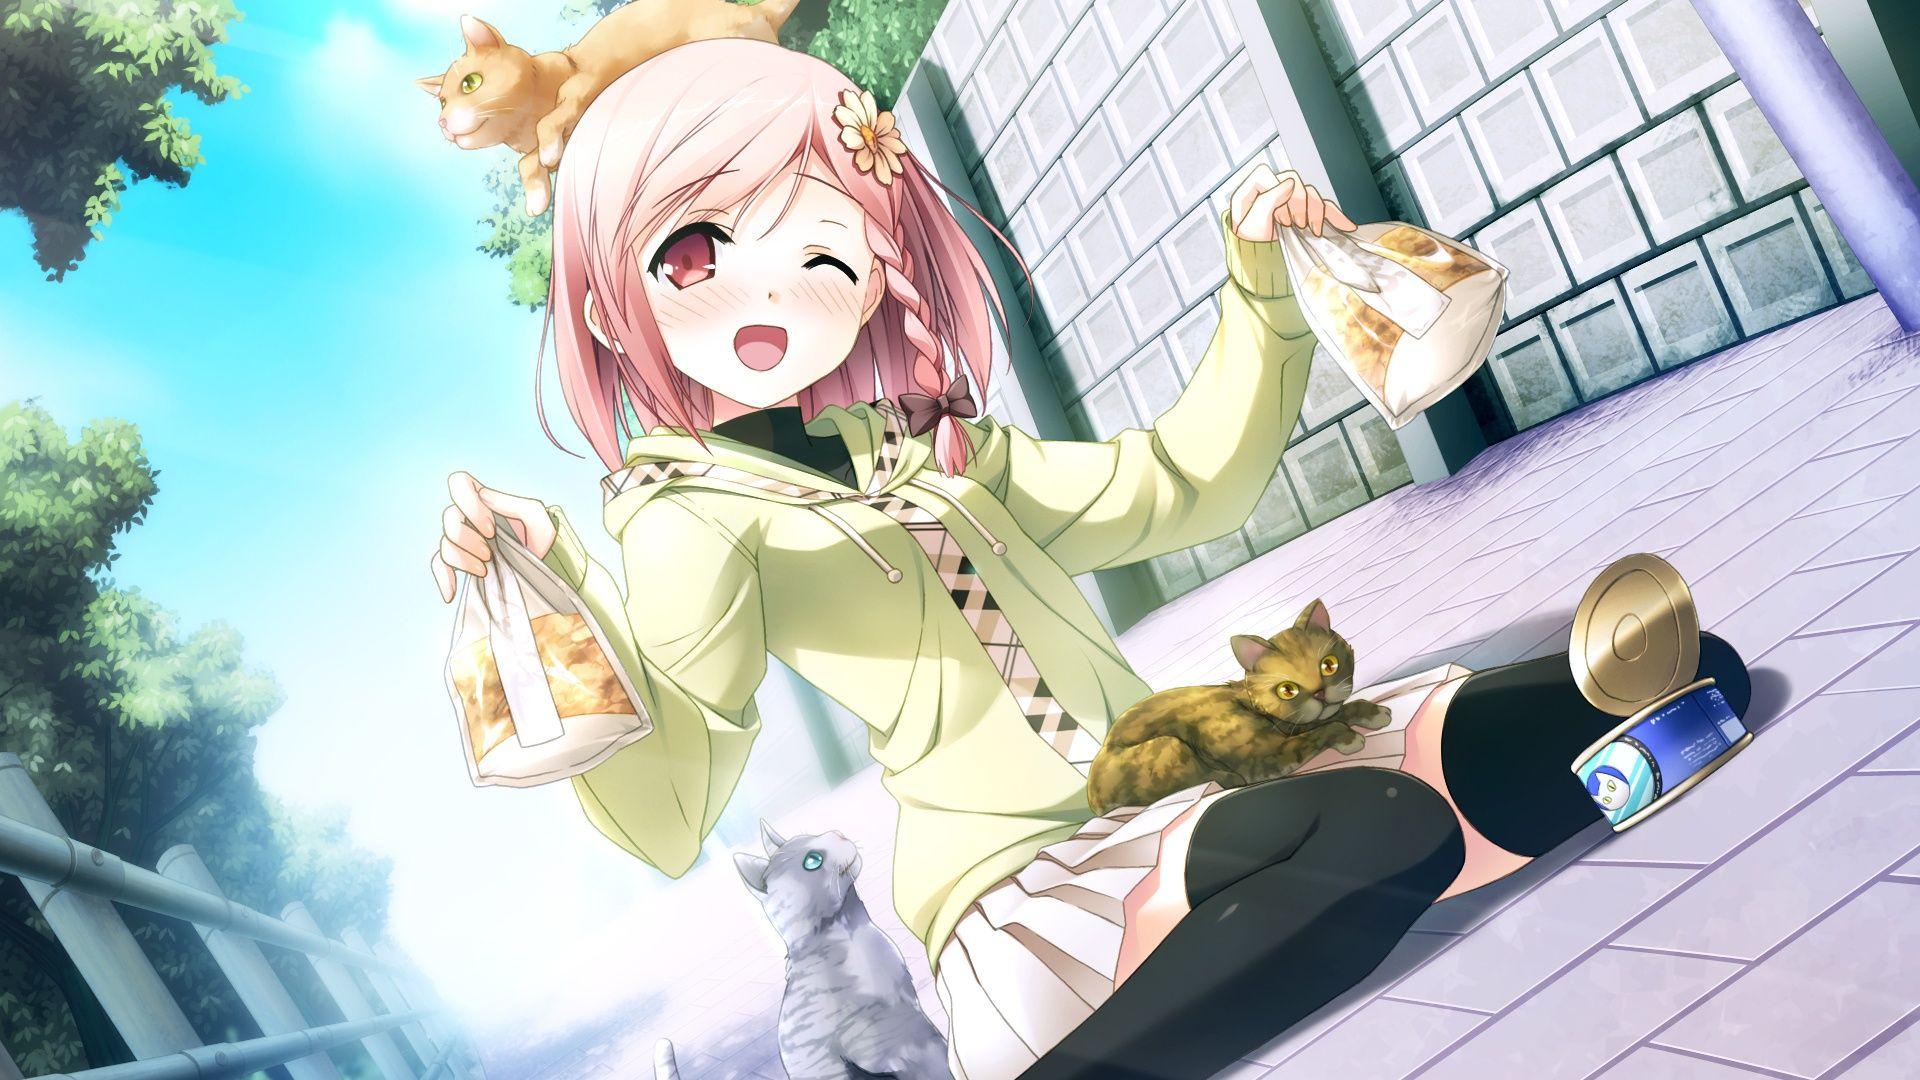 Cute Anime Cat People Wallpaper Widescreen Cute Anime Cat Anime Anime Images